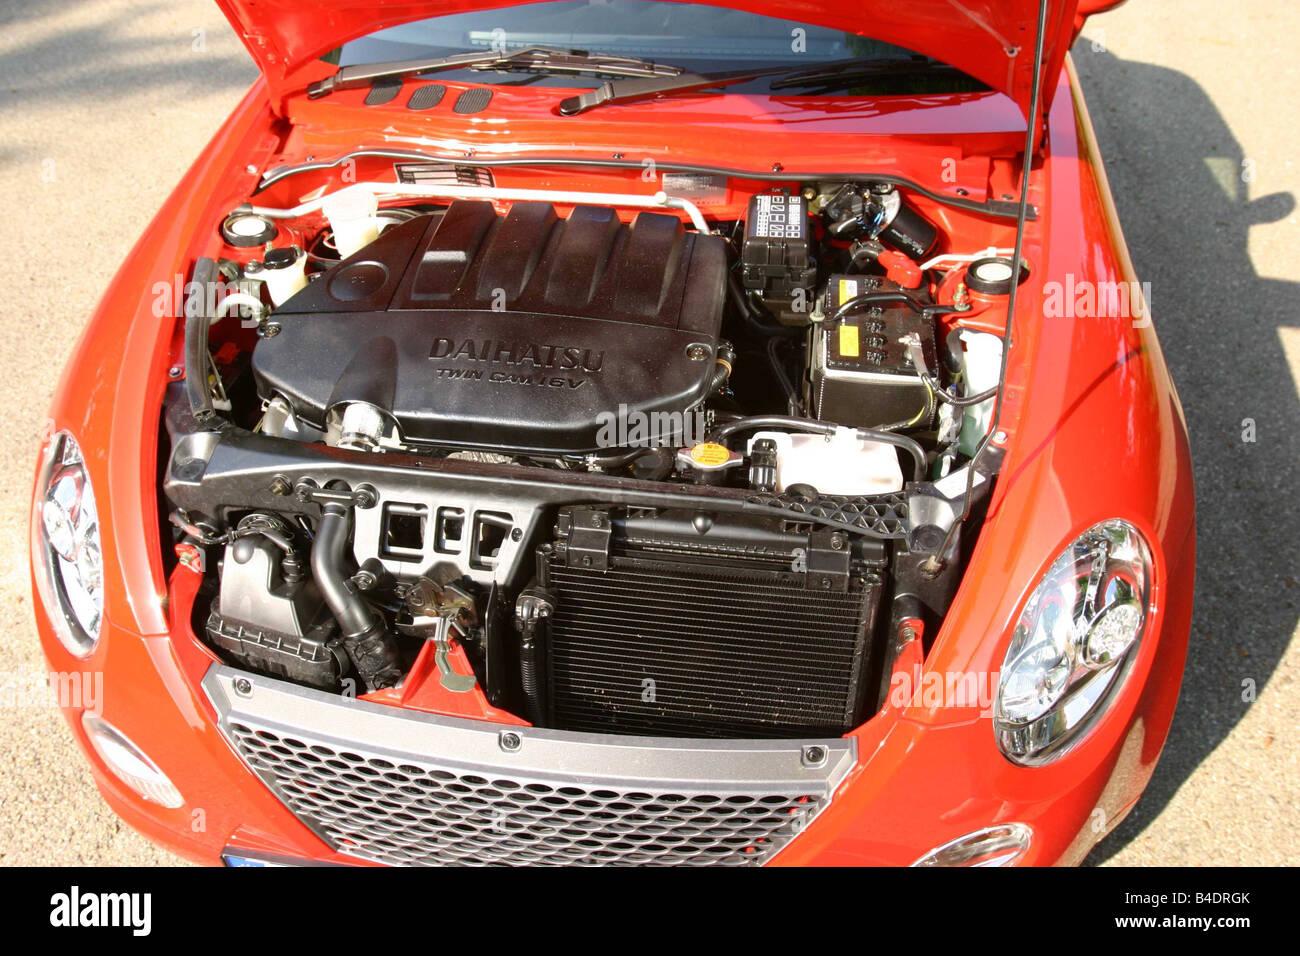 Car, Daihatsu Copen, Convertible, model year 2003-, red-orange